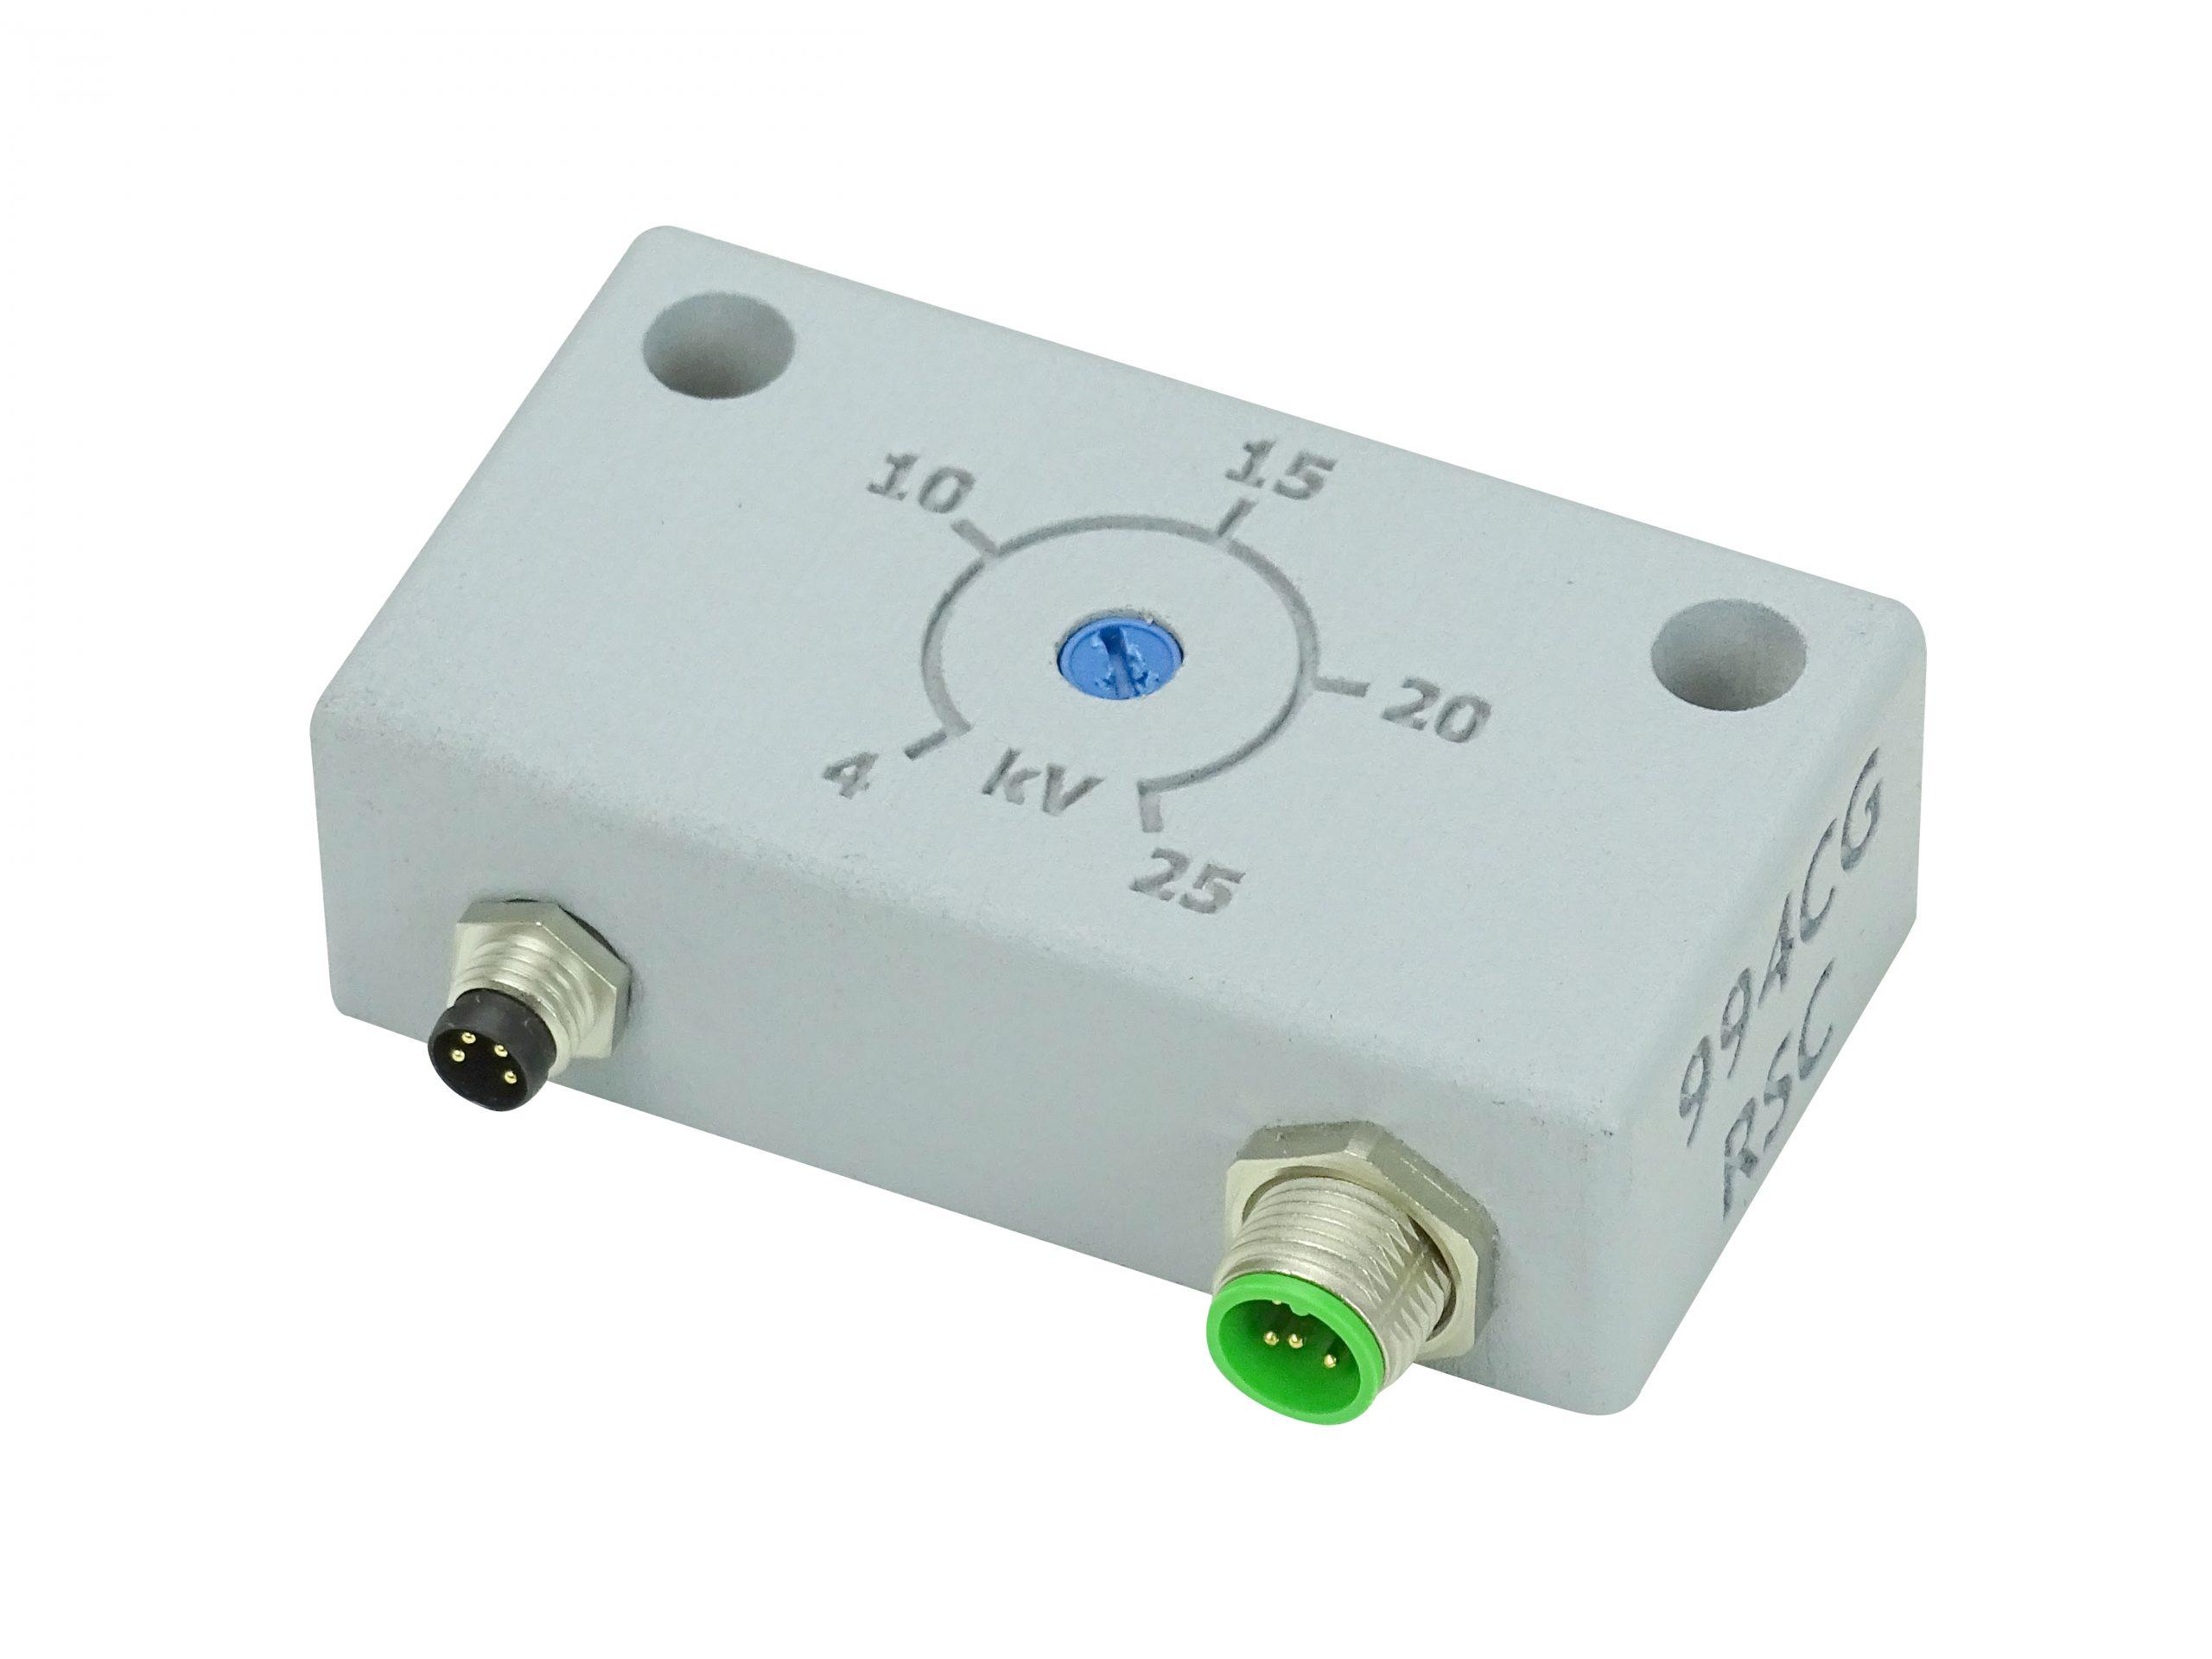 994CG Remote Setpoint Controller